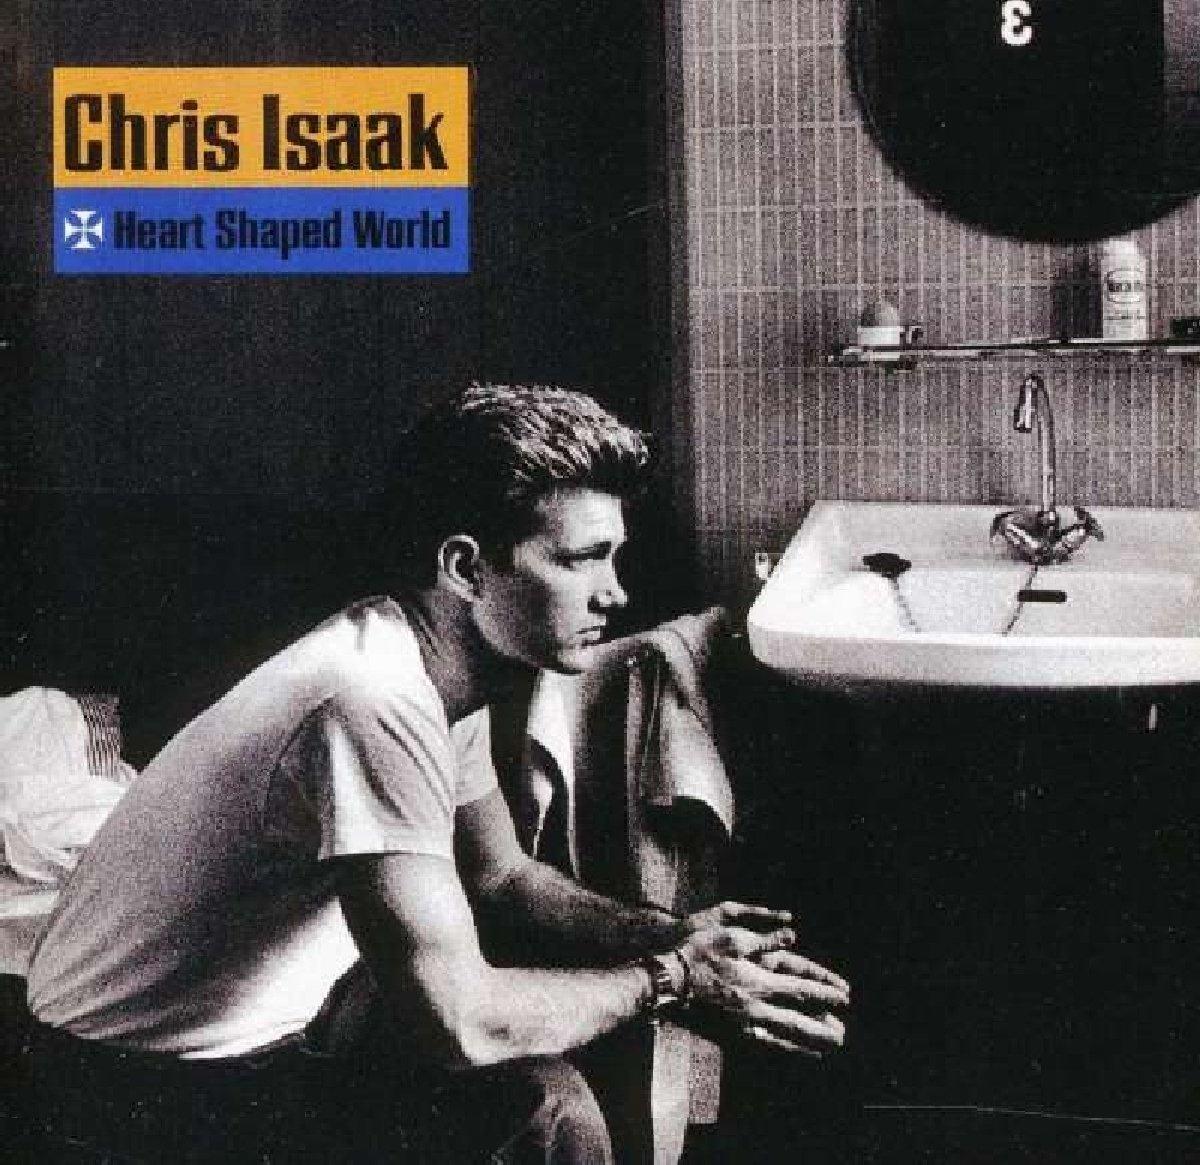 Chris Isaak - Heart Shaped World (CD)